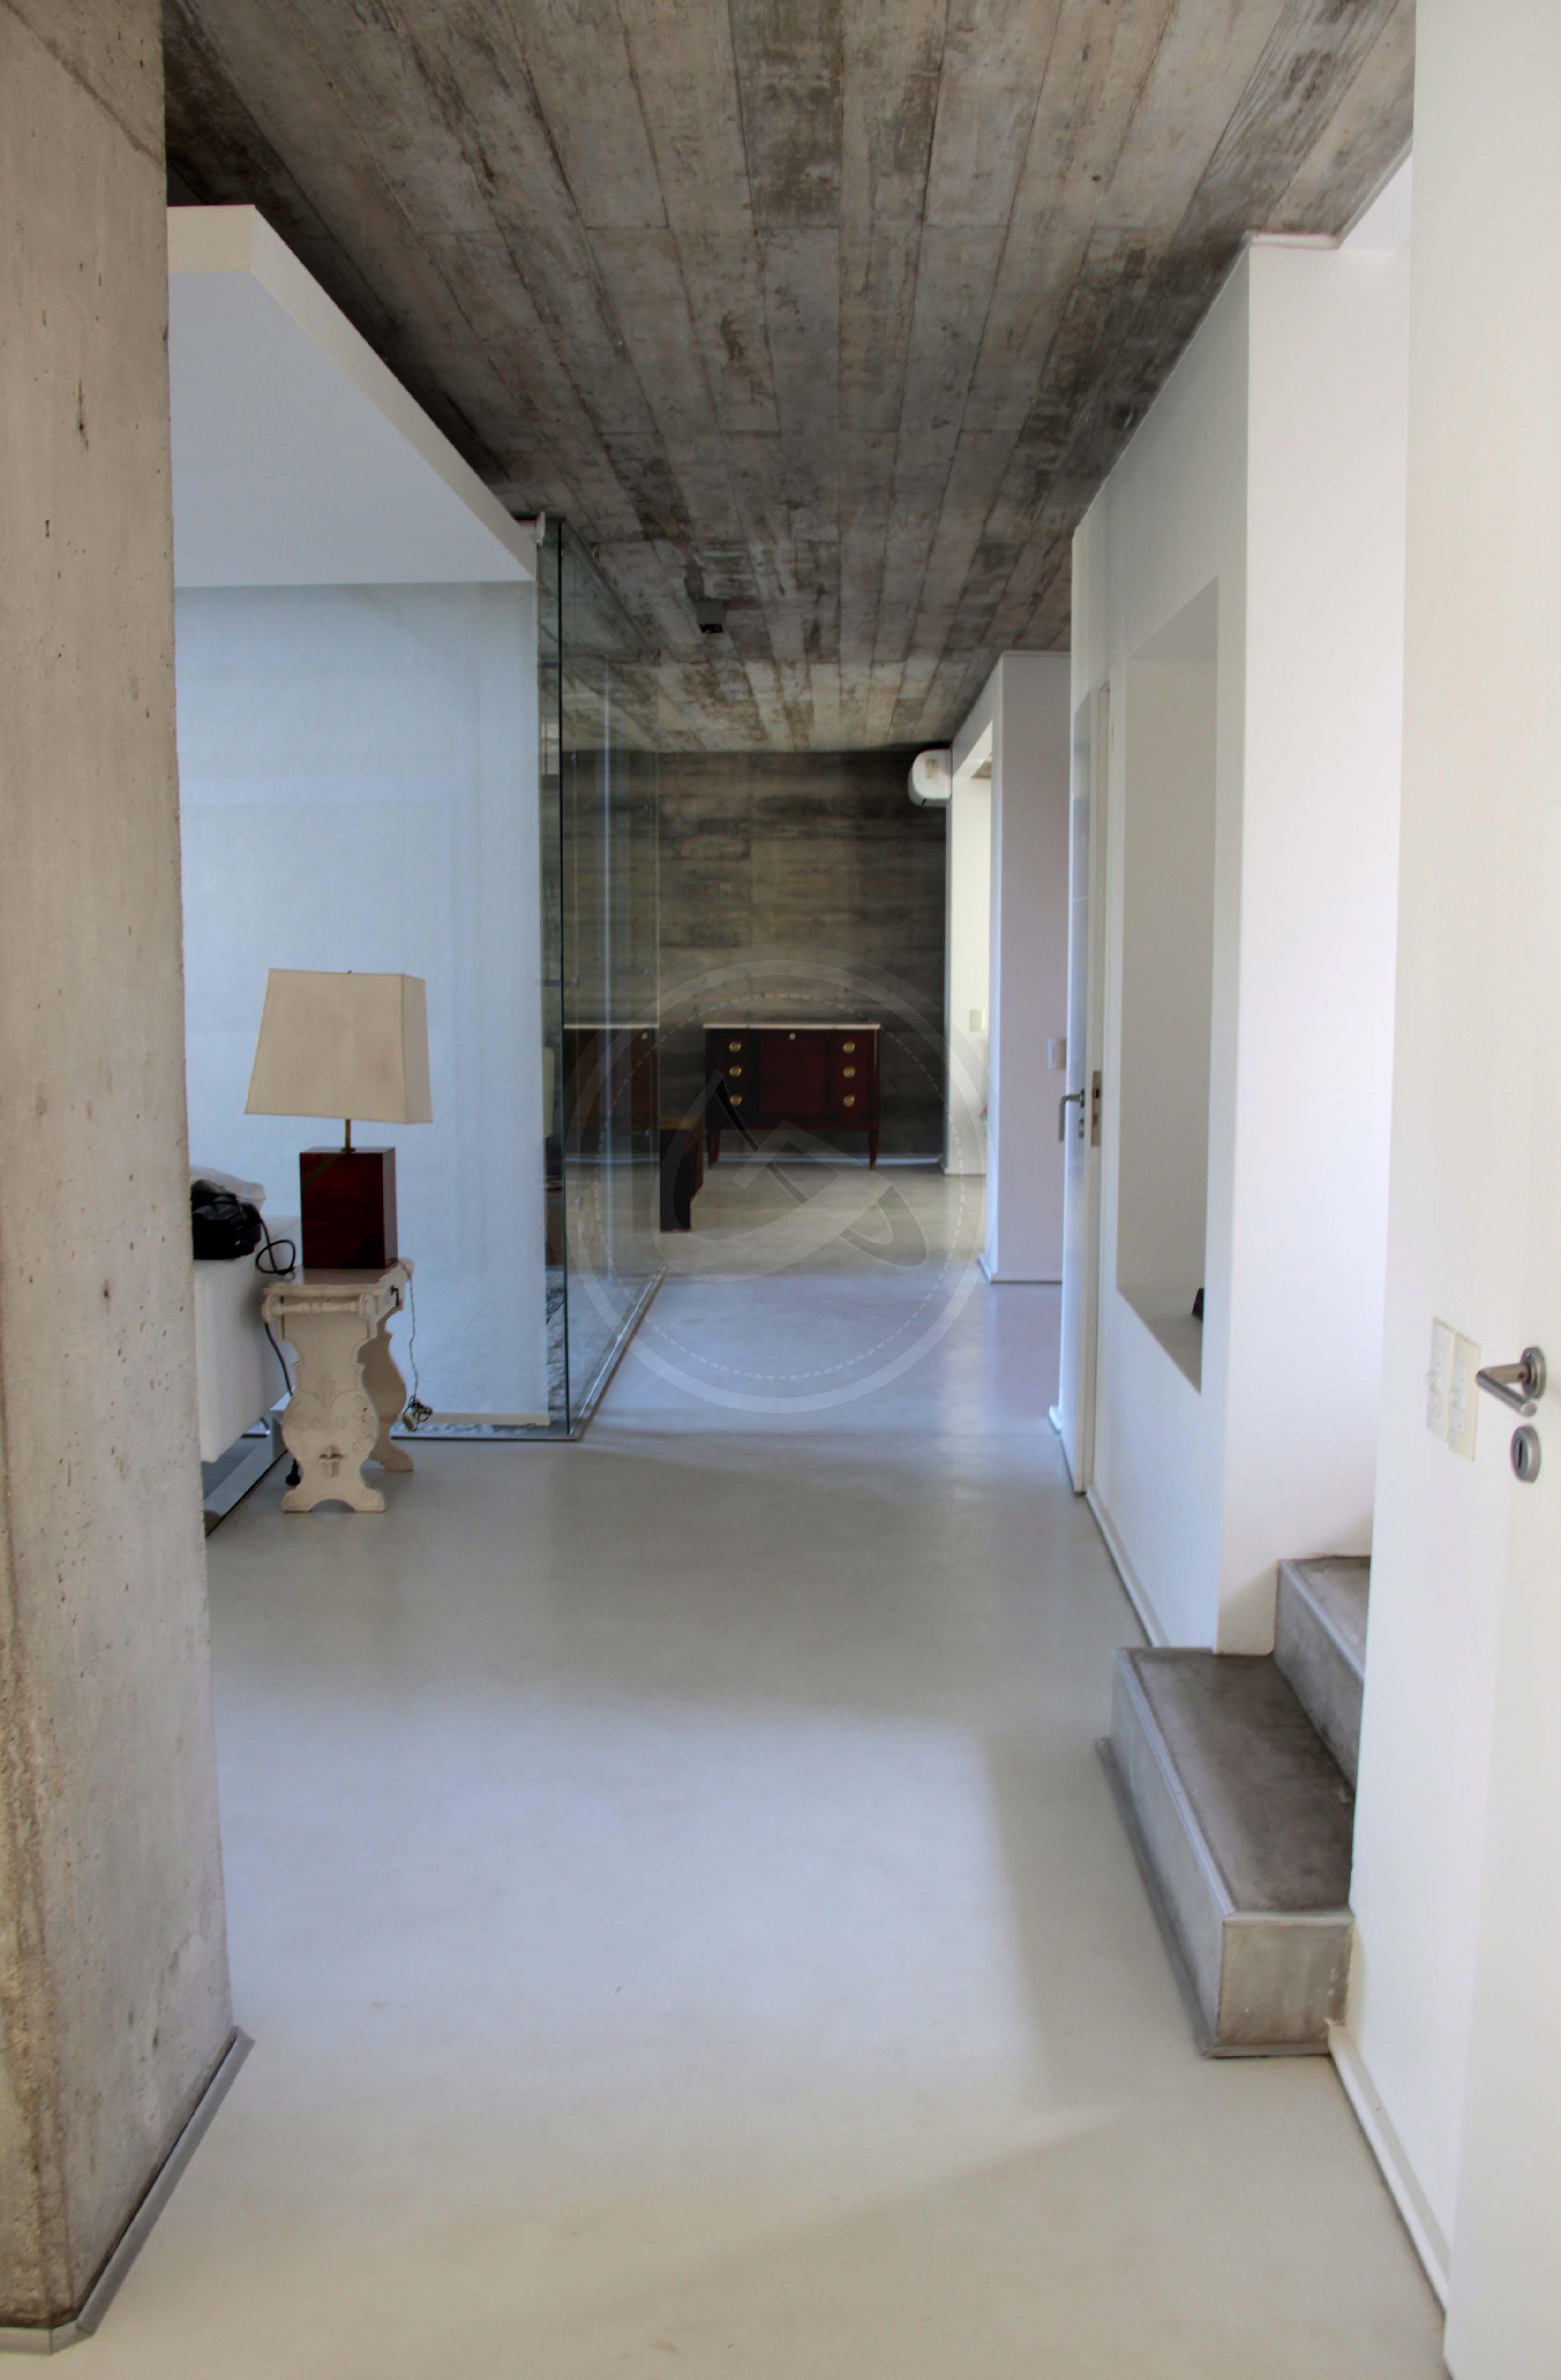 Microcemento interior showroom general alvear 789 centro c rdoba tel 0351 4240297 - Microcemento cordoba ...